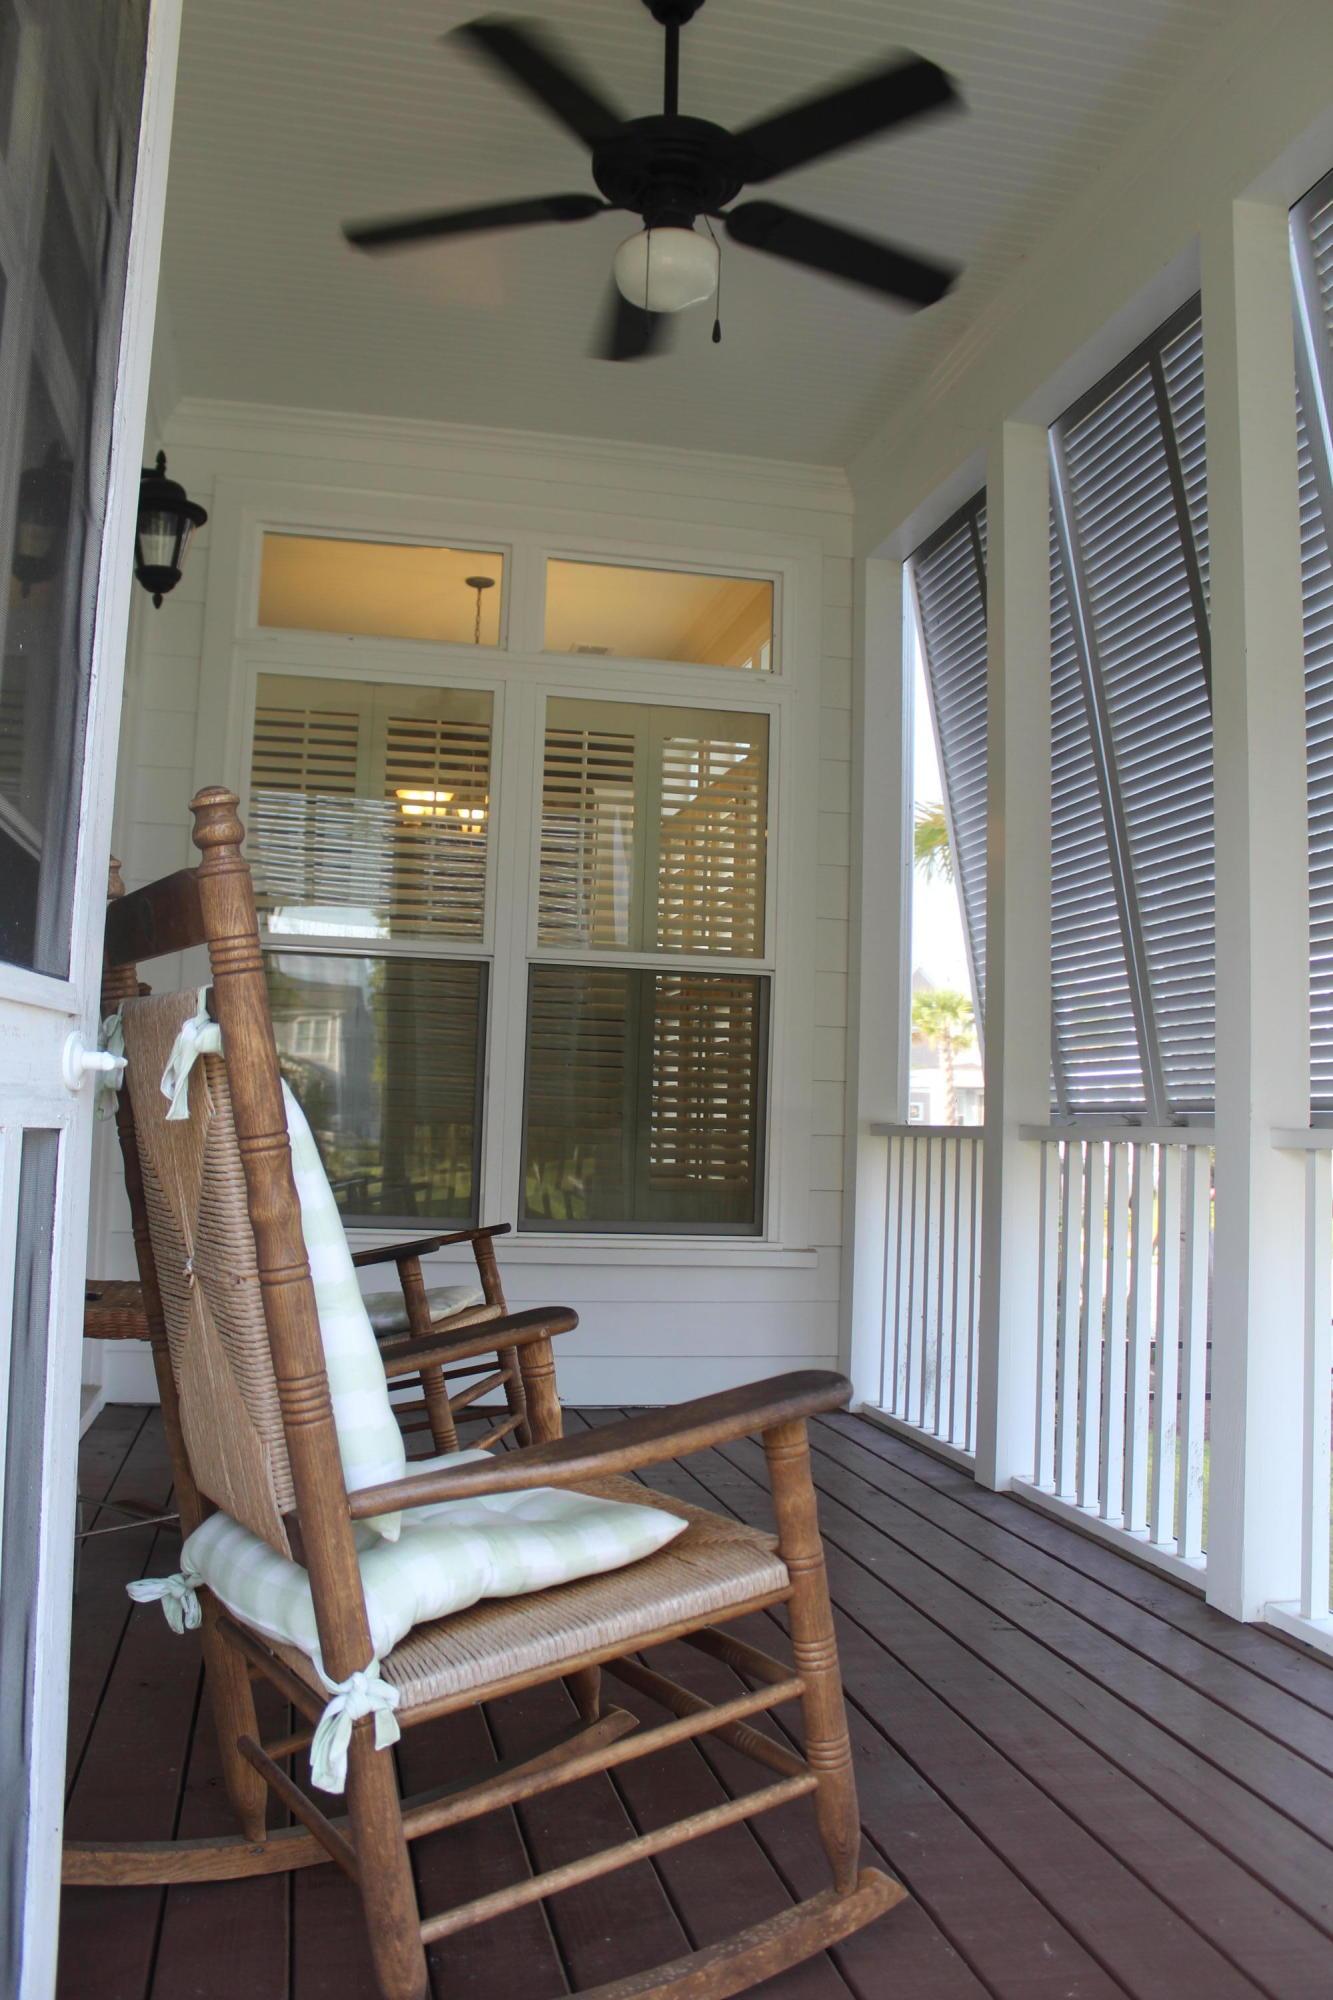 Dunes West Homes For Sale - 1403 Masthead, Mount Pleasant, SC - 14